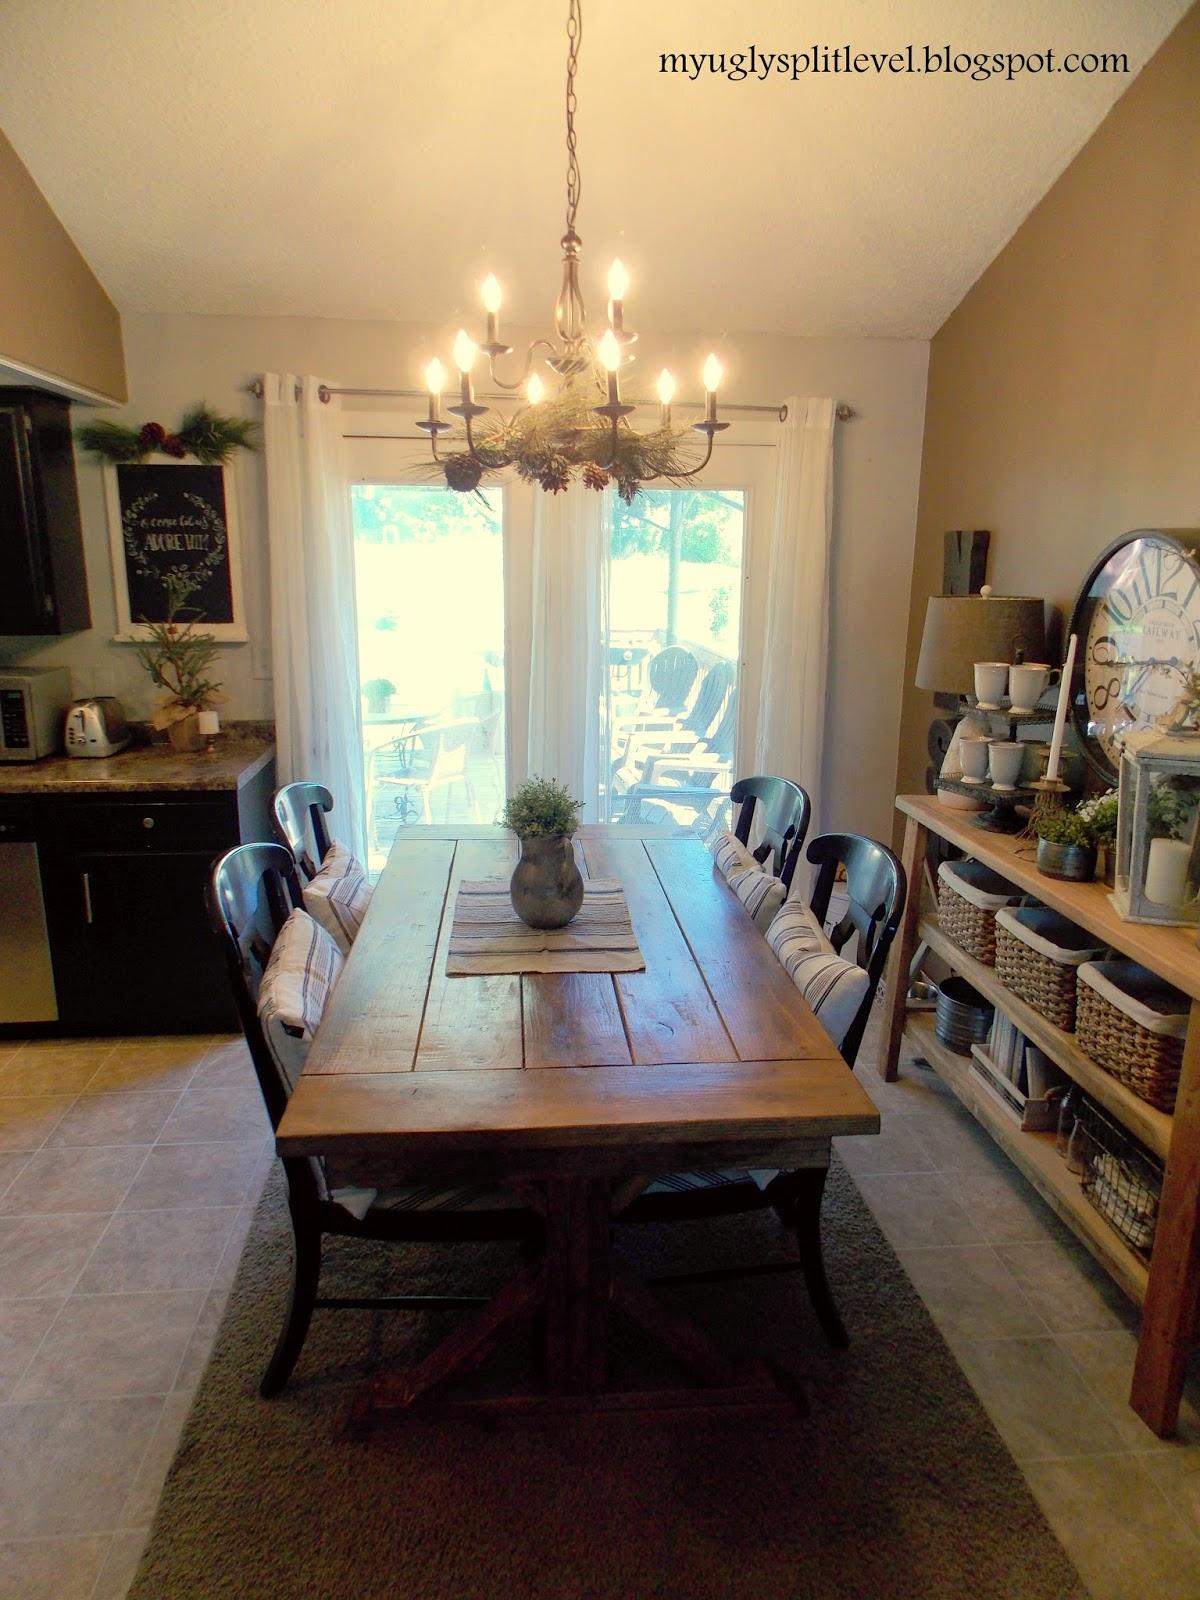 My Ugly Split-level: Dining Room. Finally.